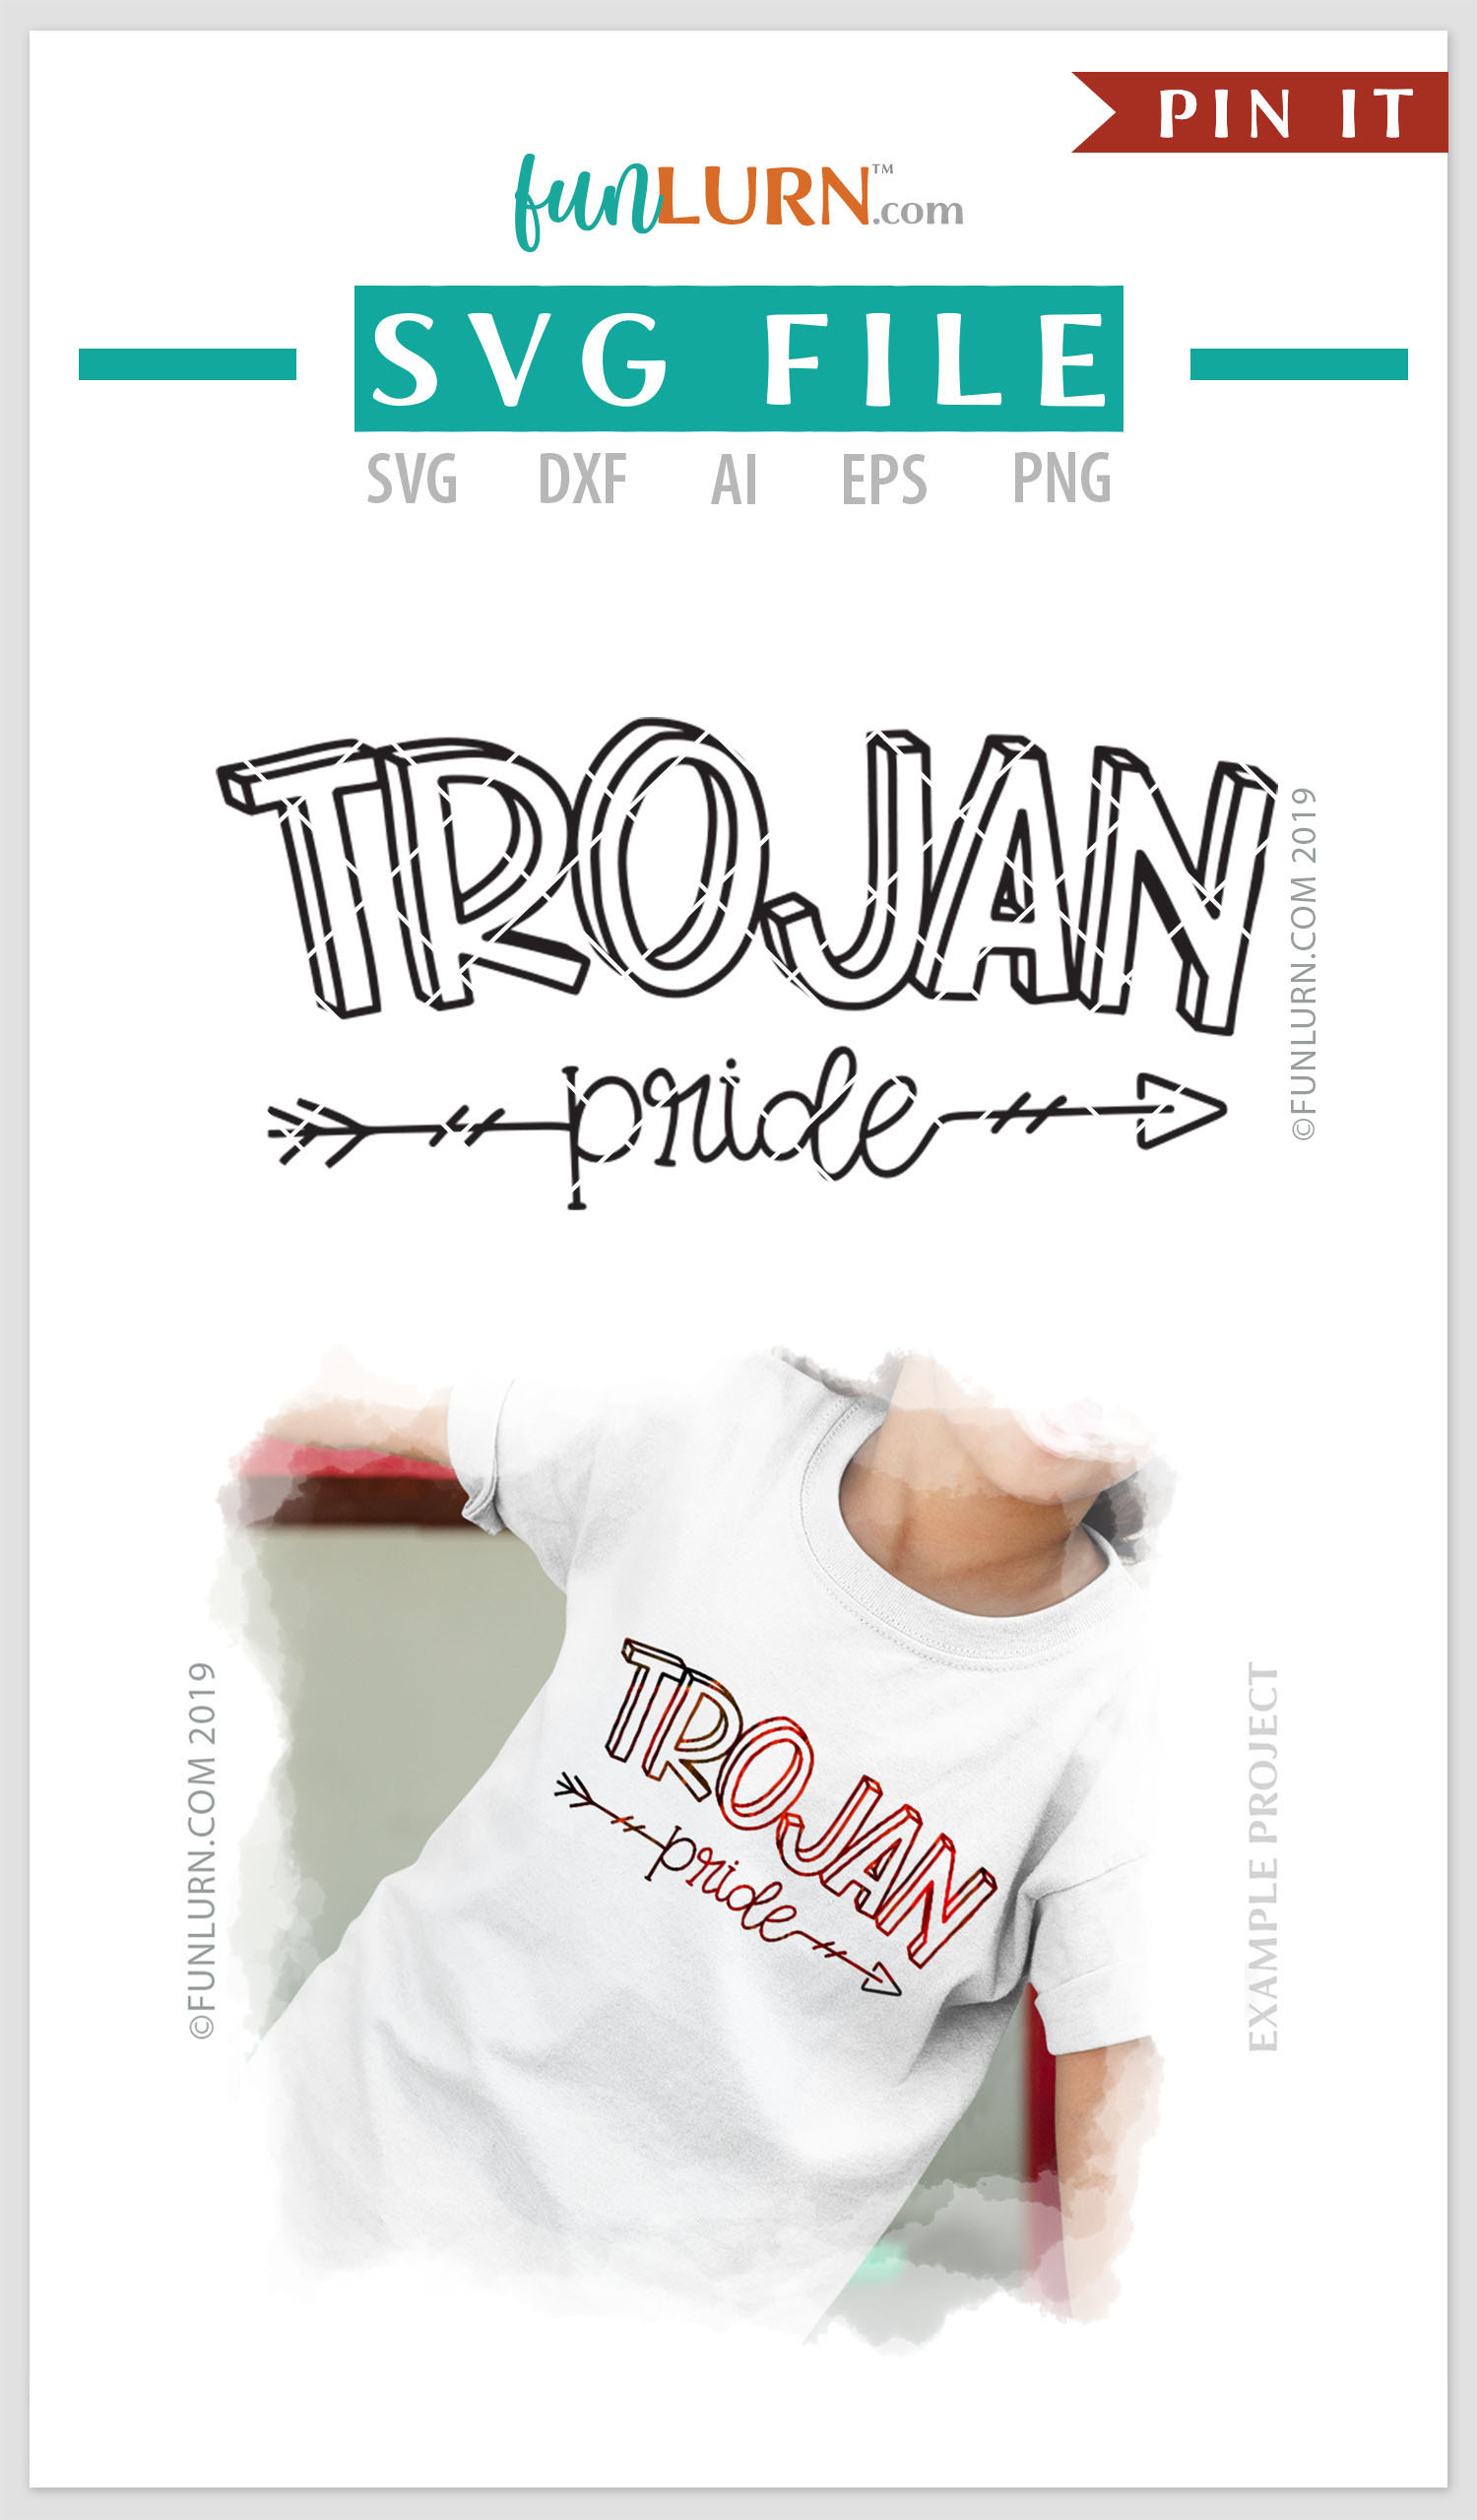 Trojan Pride Team SVG Cut File example image 4